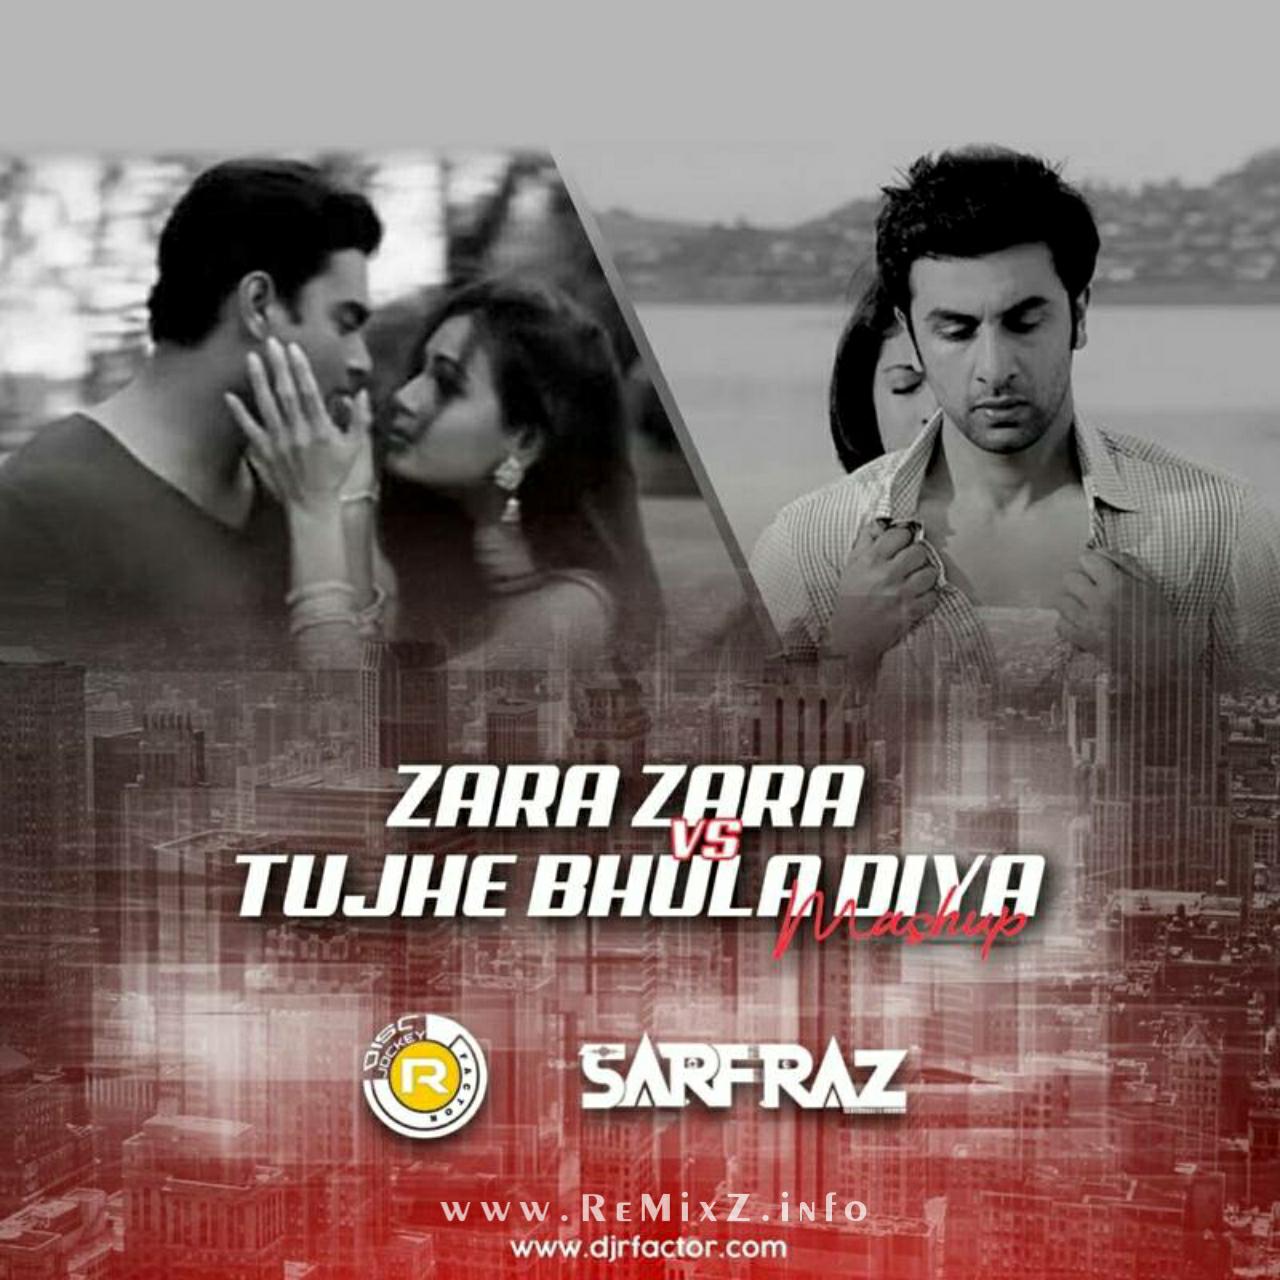 Zara-Zara-VS-Tujhe-Bhula-Diya-Mashup-DJ-R-Factor-X-SARFRAZ.jpg